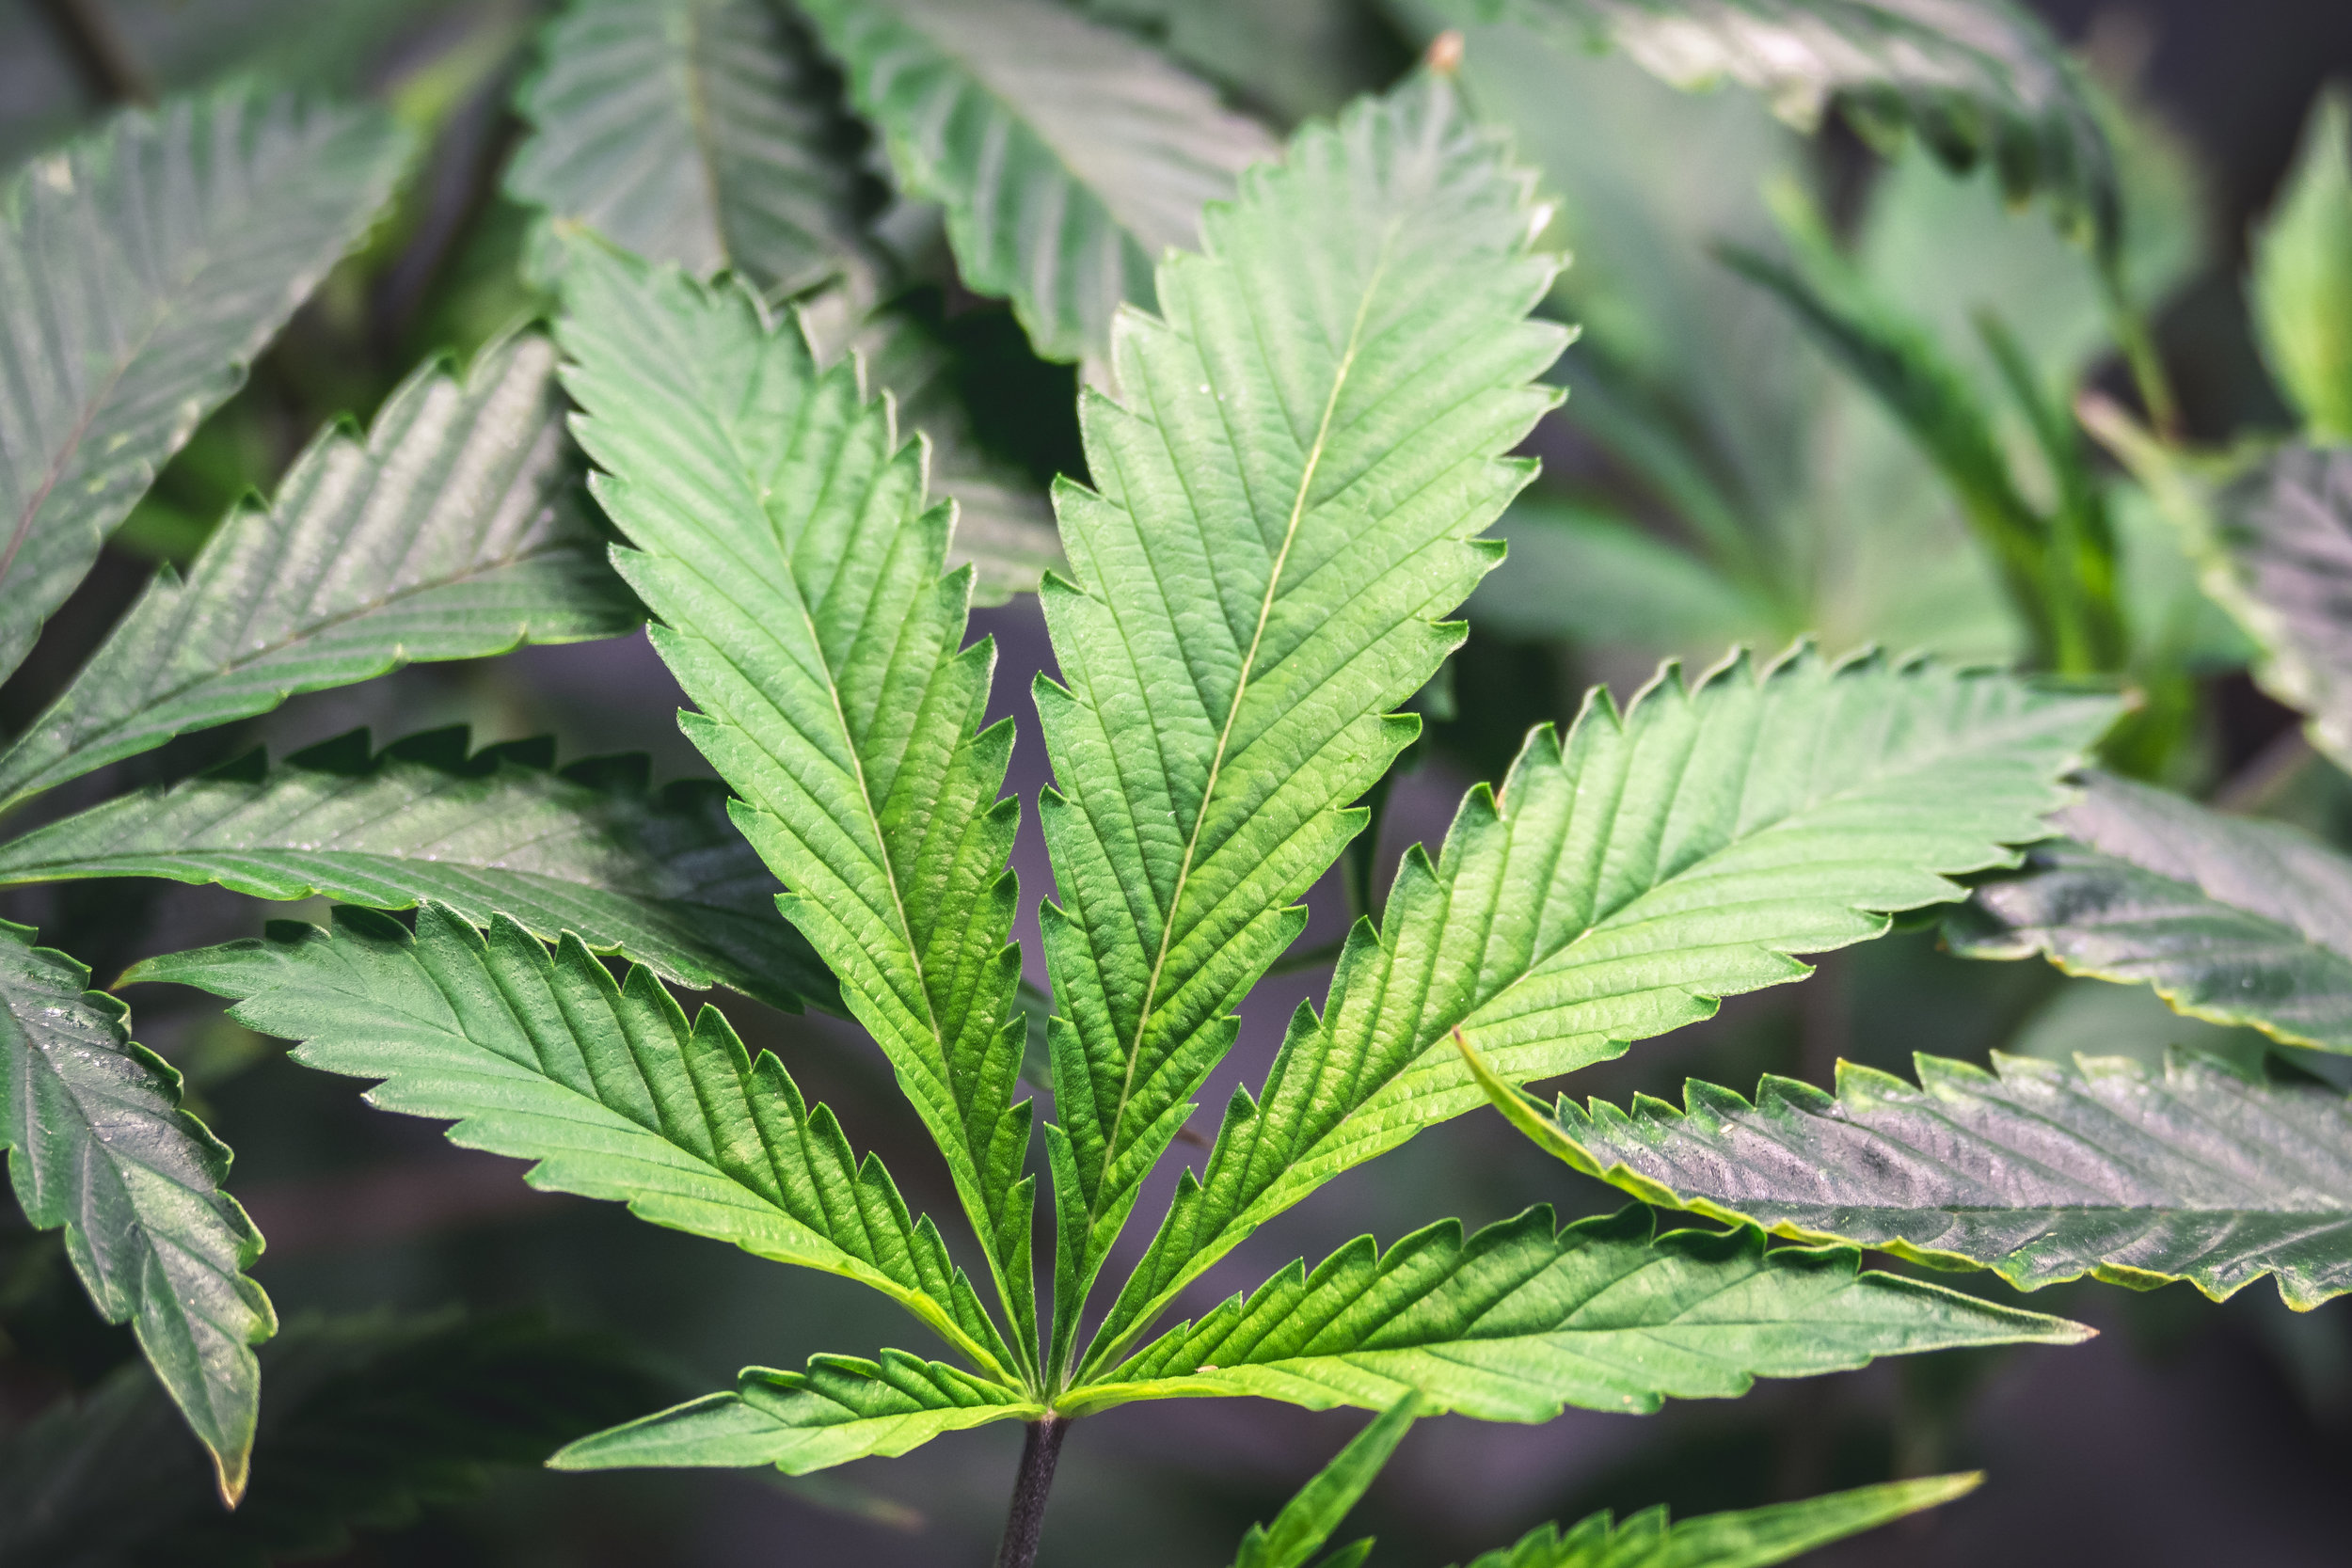 Bright_Green_Weed_Leaf_on_Colorful_Marijuana_Plant.jpg